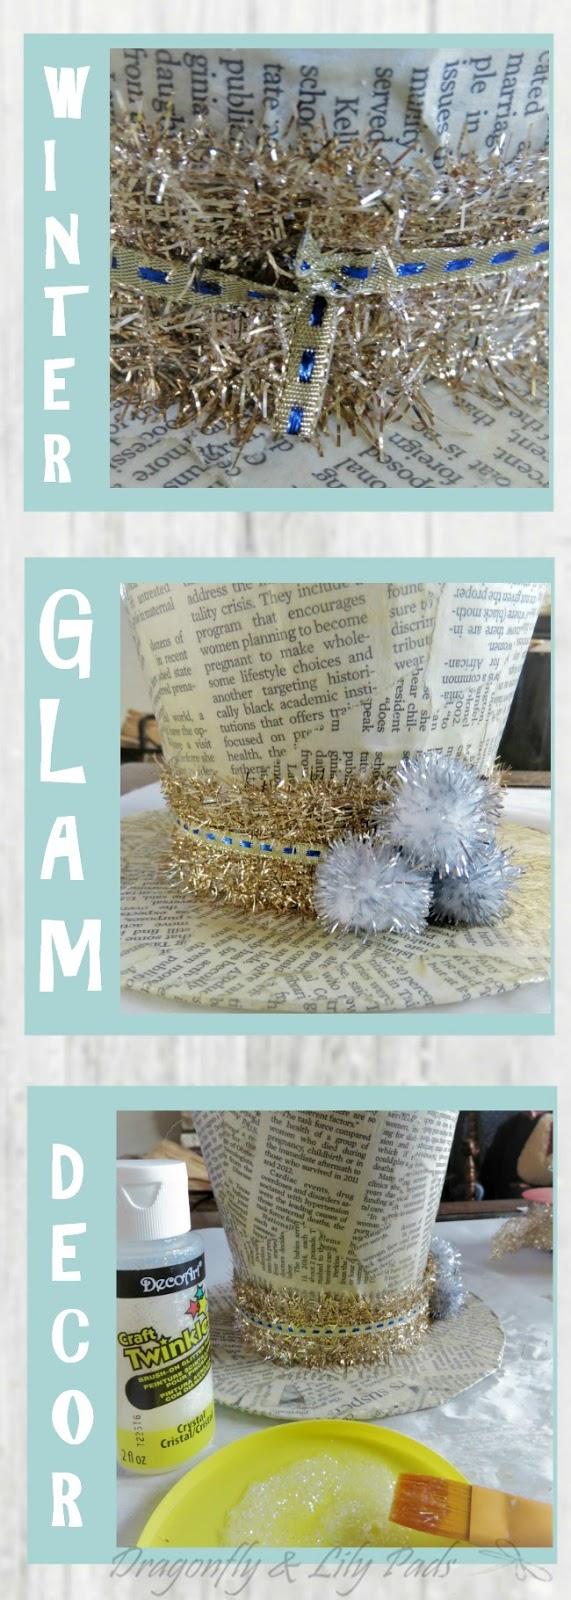 DIY Winter Glam Decor Tutorial last three steps after letting it dry overnight.